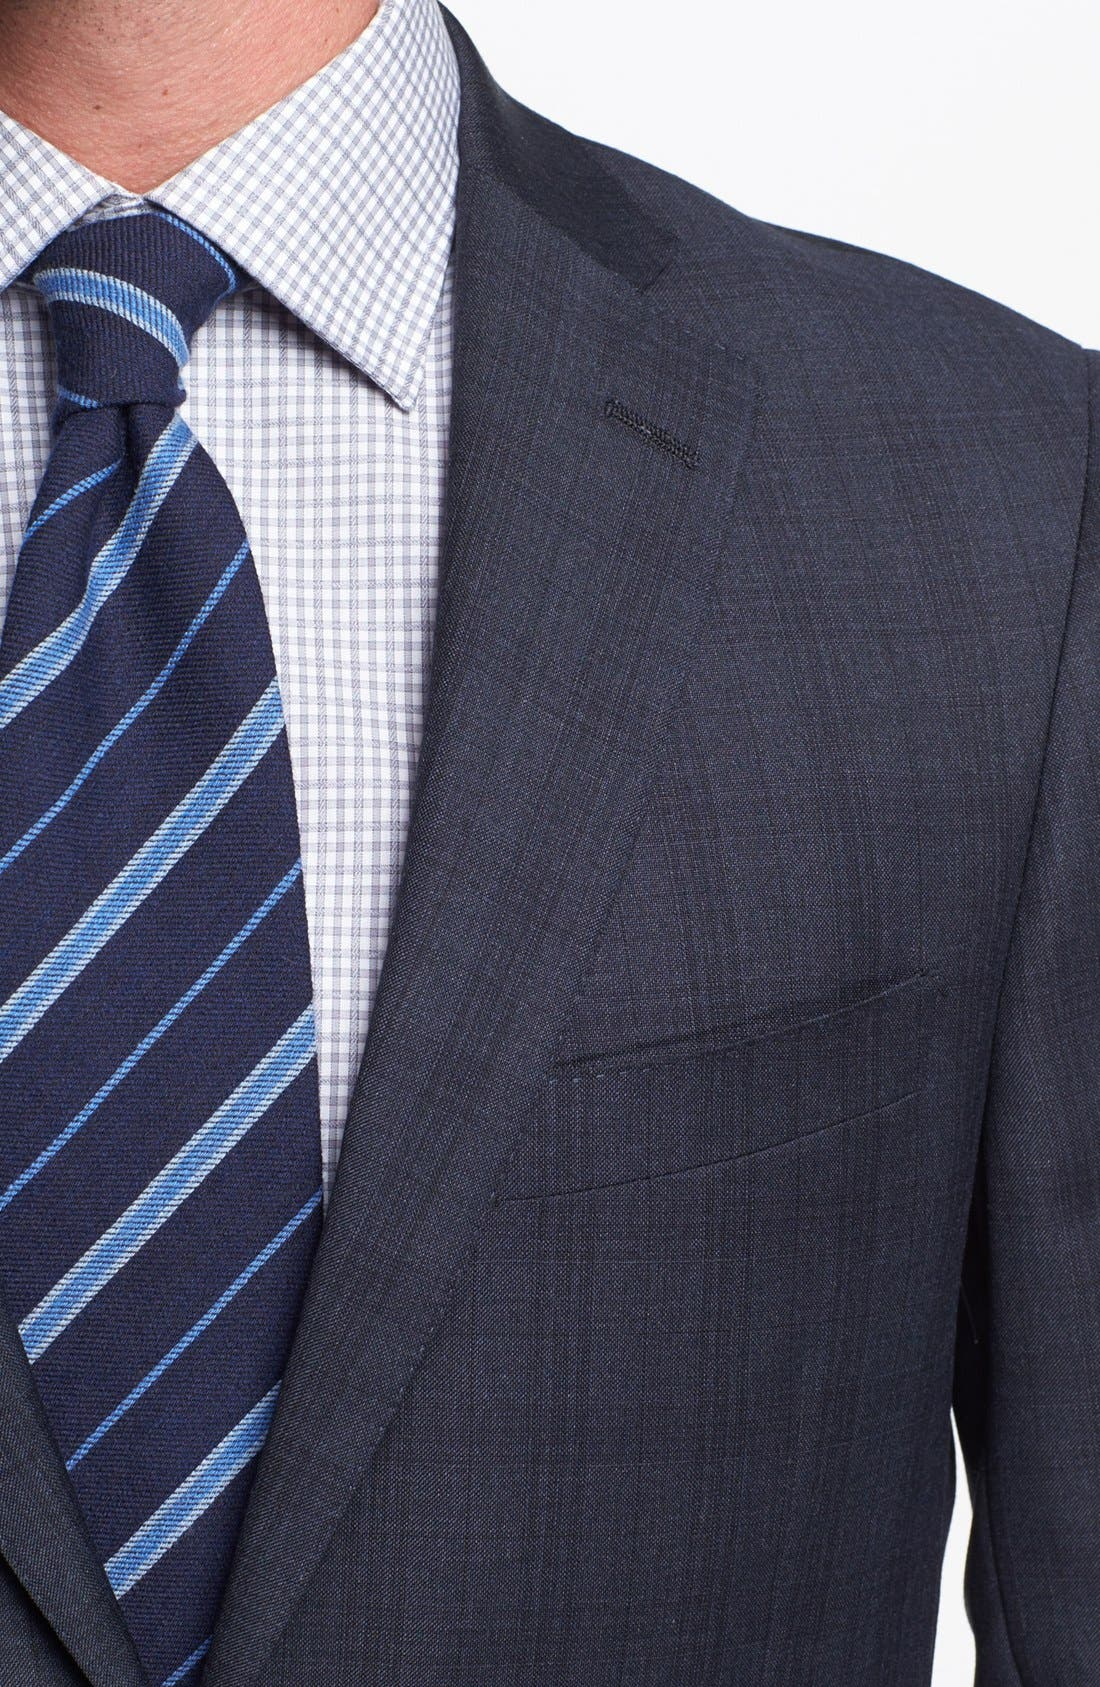 Alternate Image 2  - Hart Schaffner Marx Classic Fit Plaid Suit